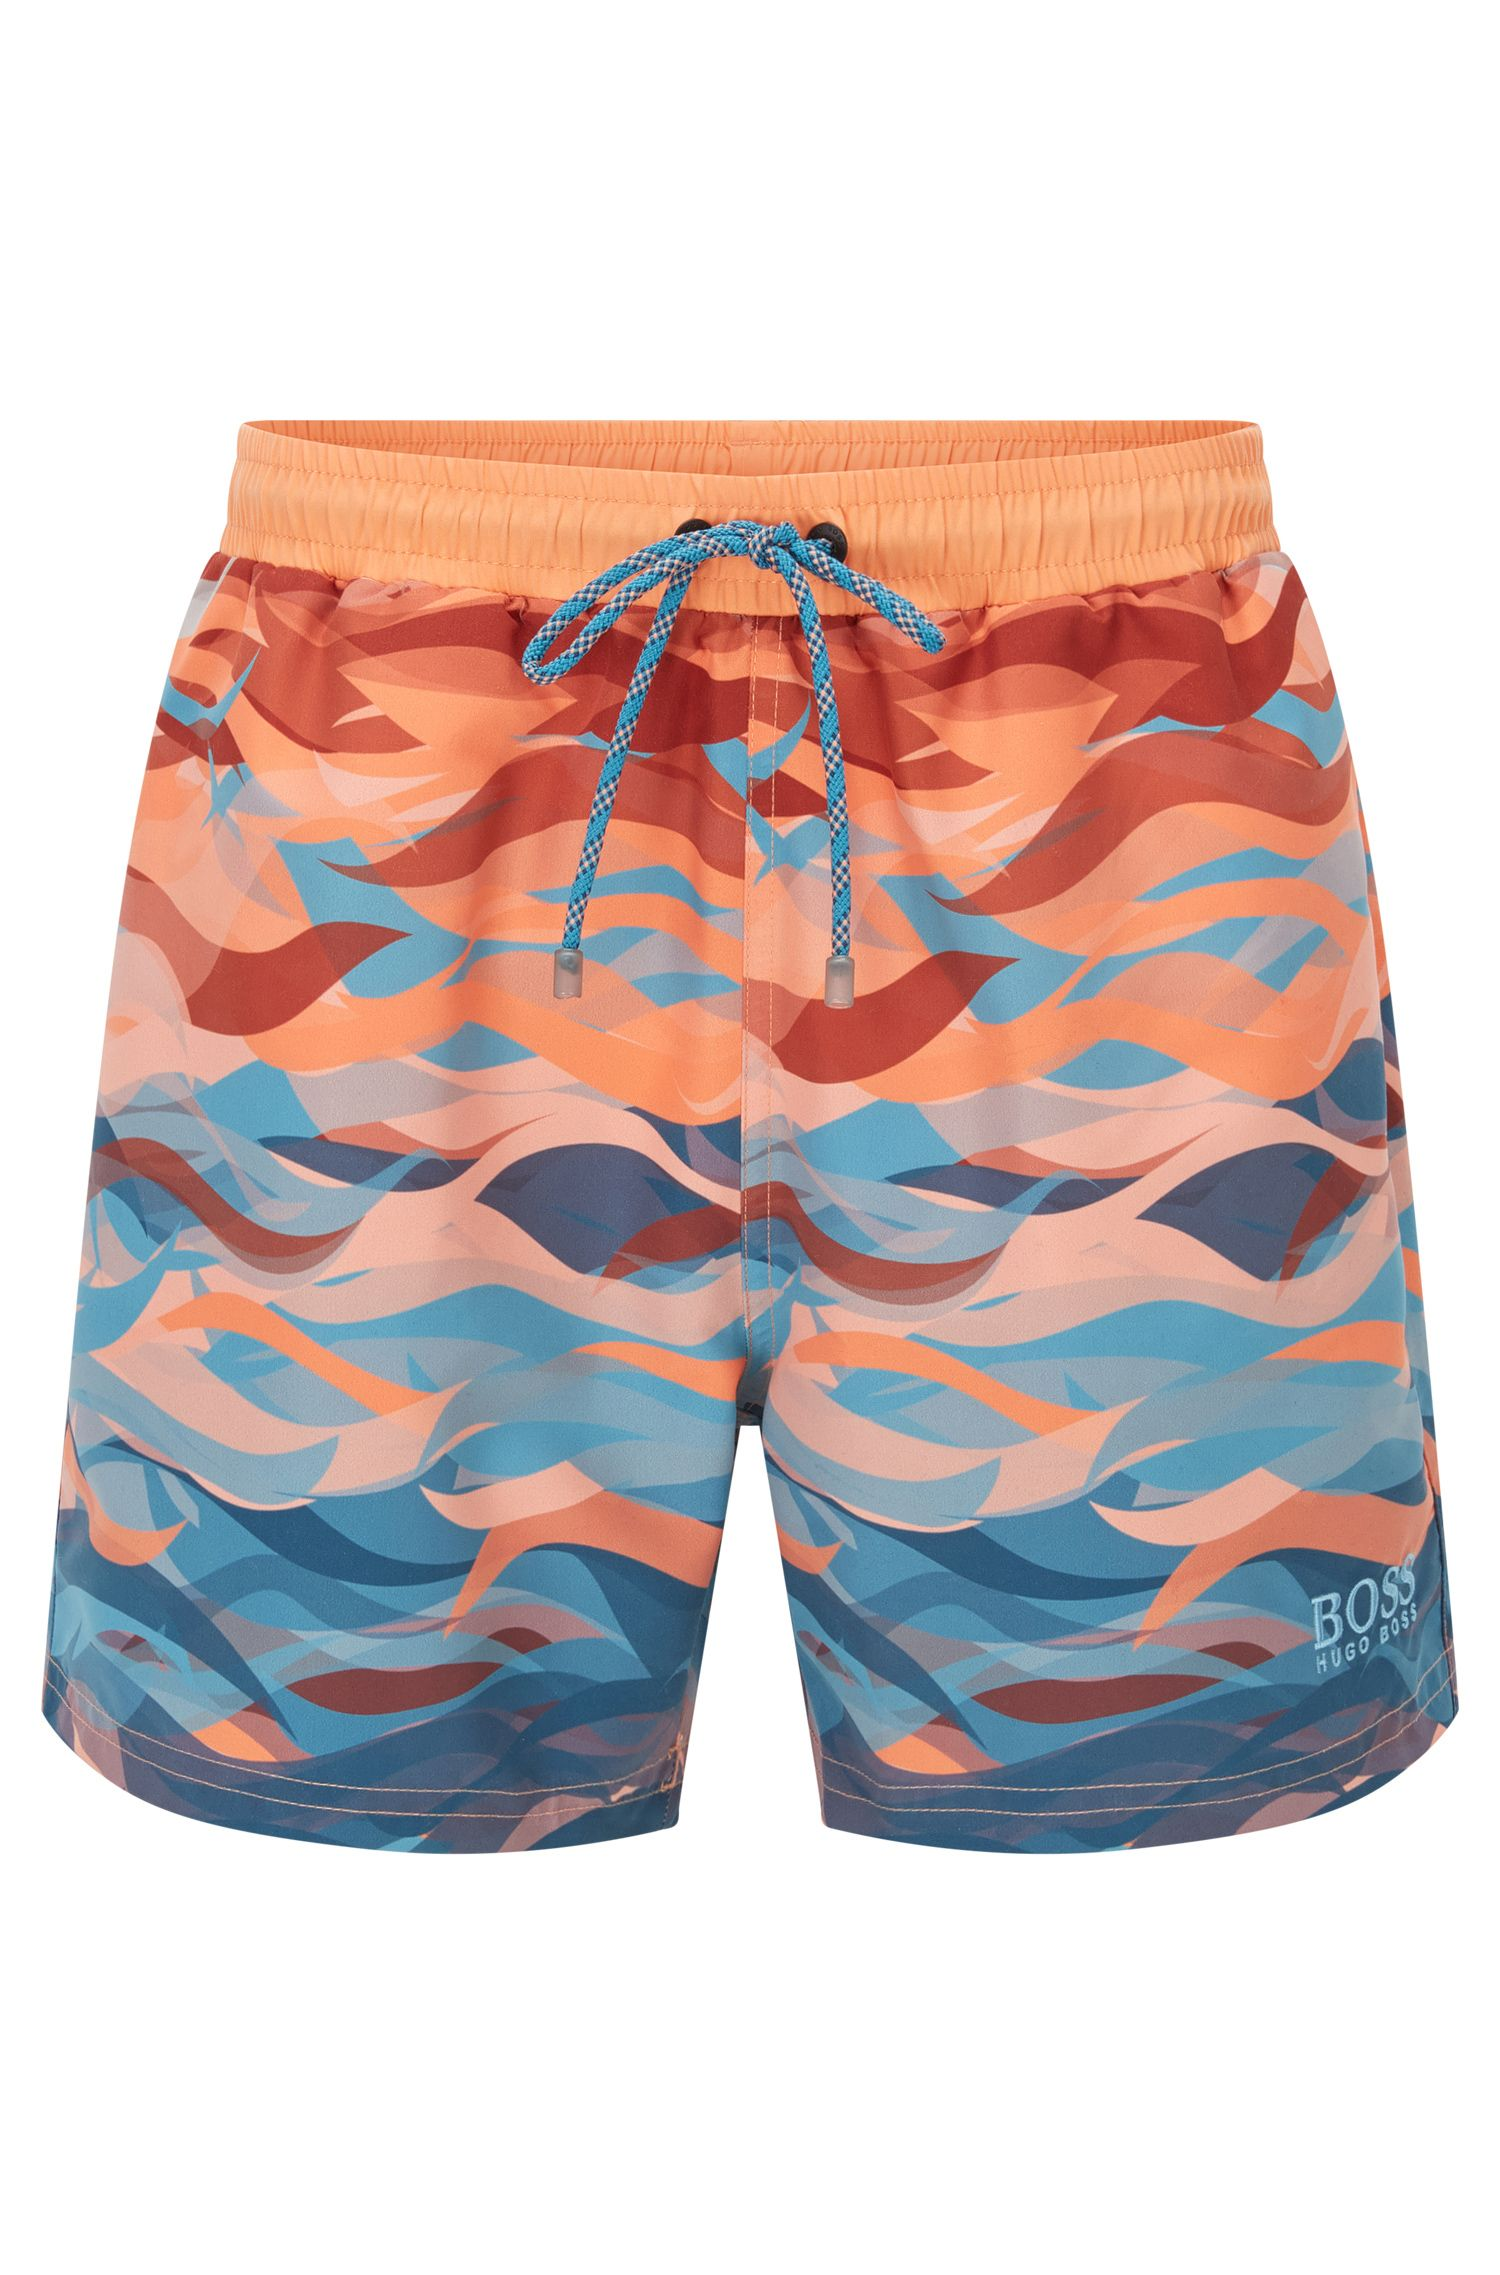 Quick Dry Swim Trunk | Piranha